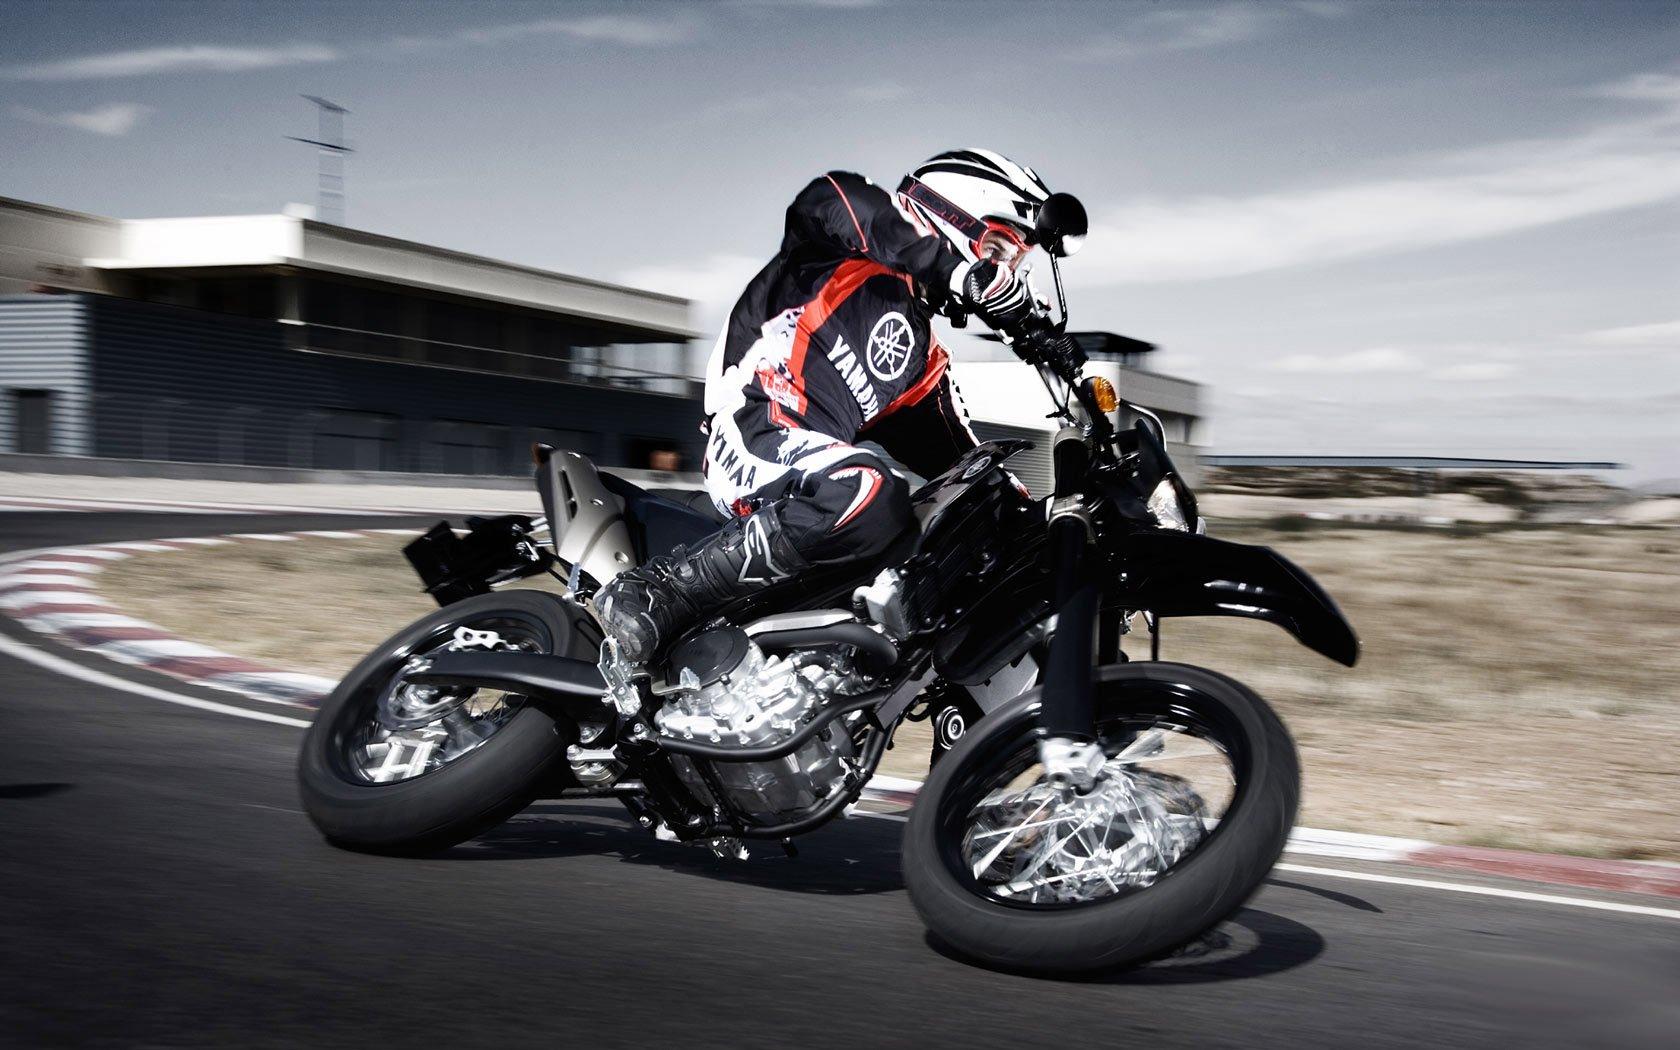 Yamaha Super Moto Hd Wallpaper Wallpapers Maniac 1680x1050